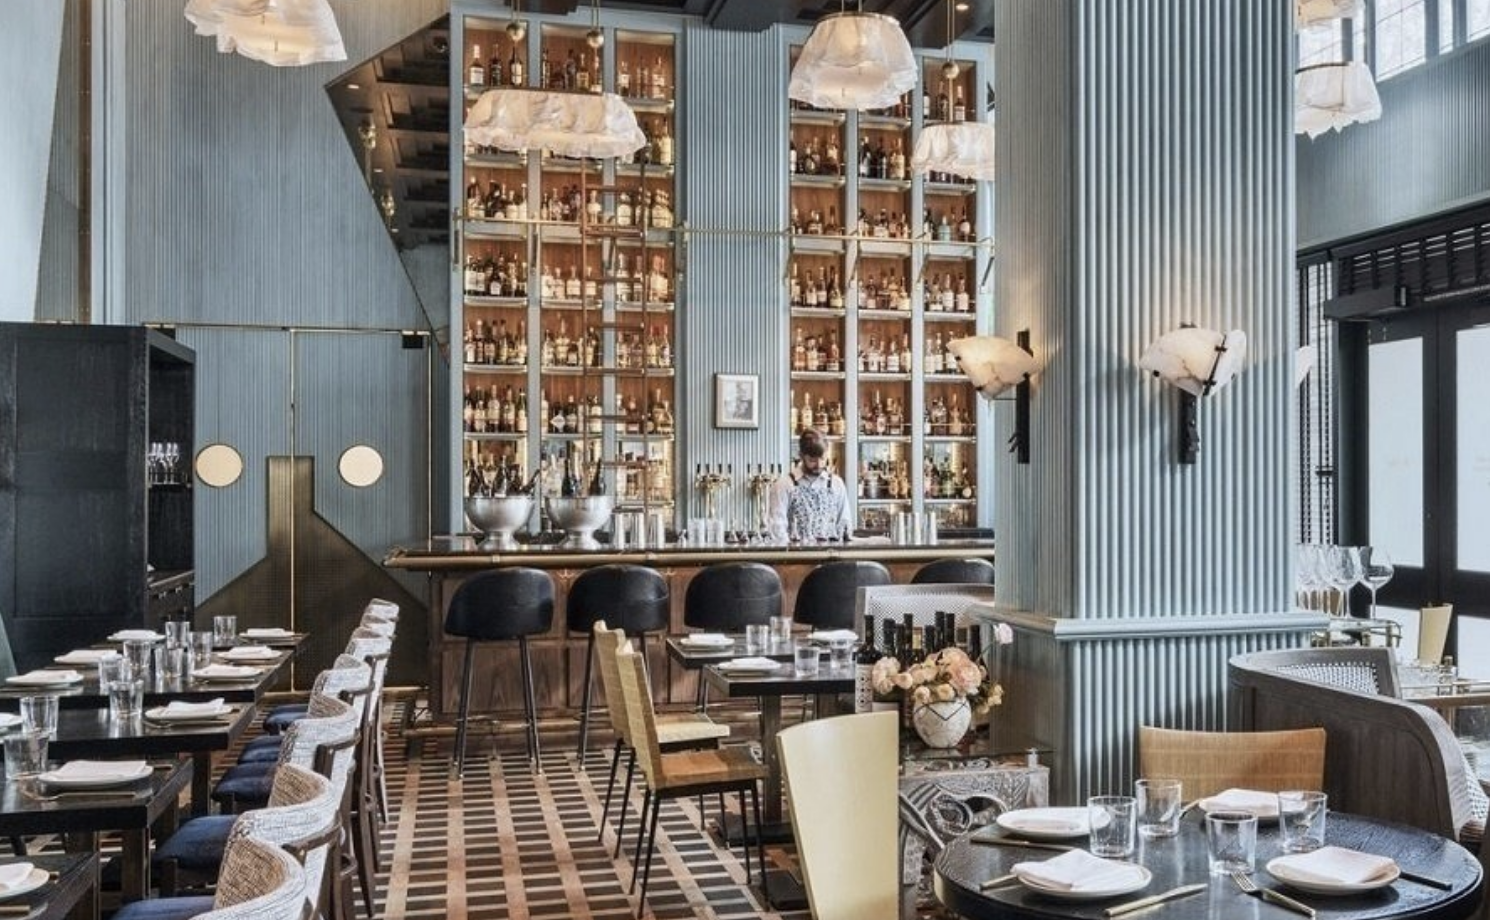 7x7^ The Best Hotel Restaurants in San Francisco